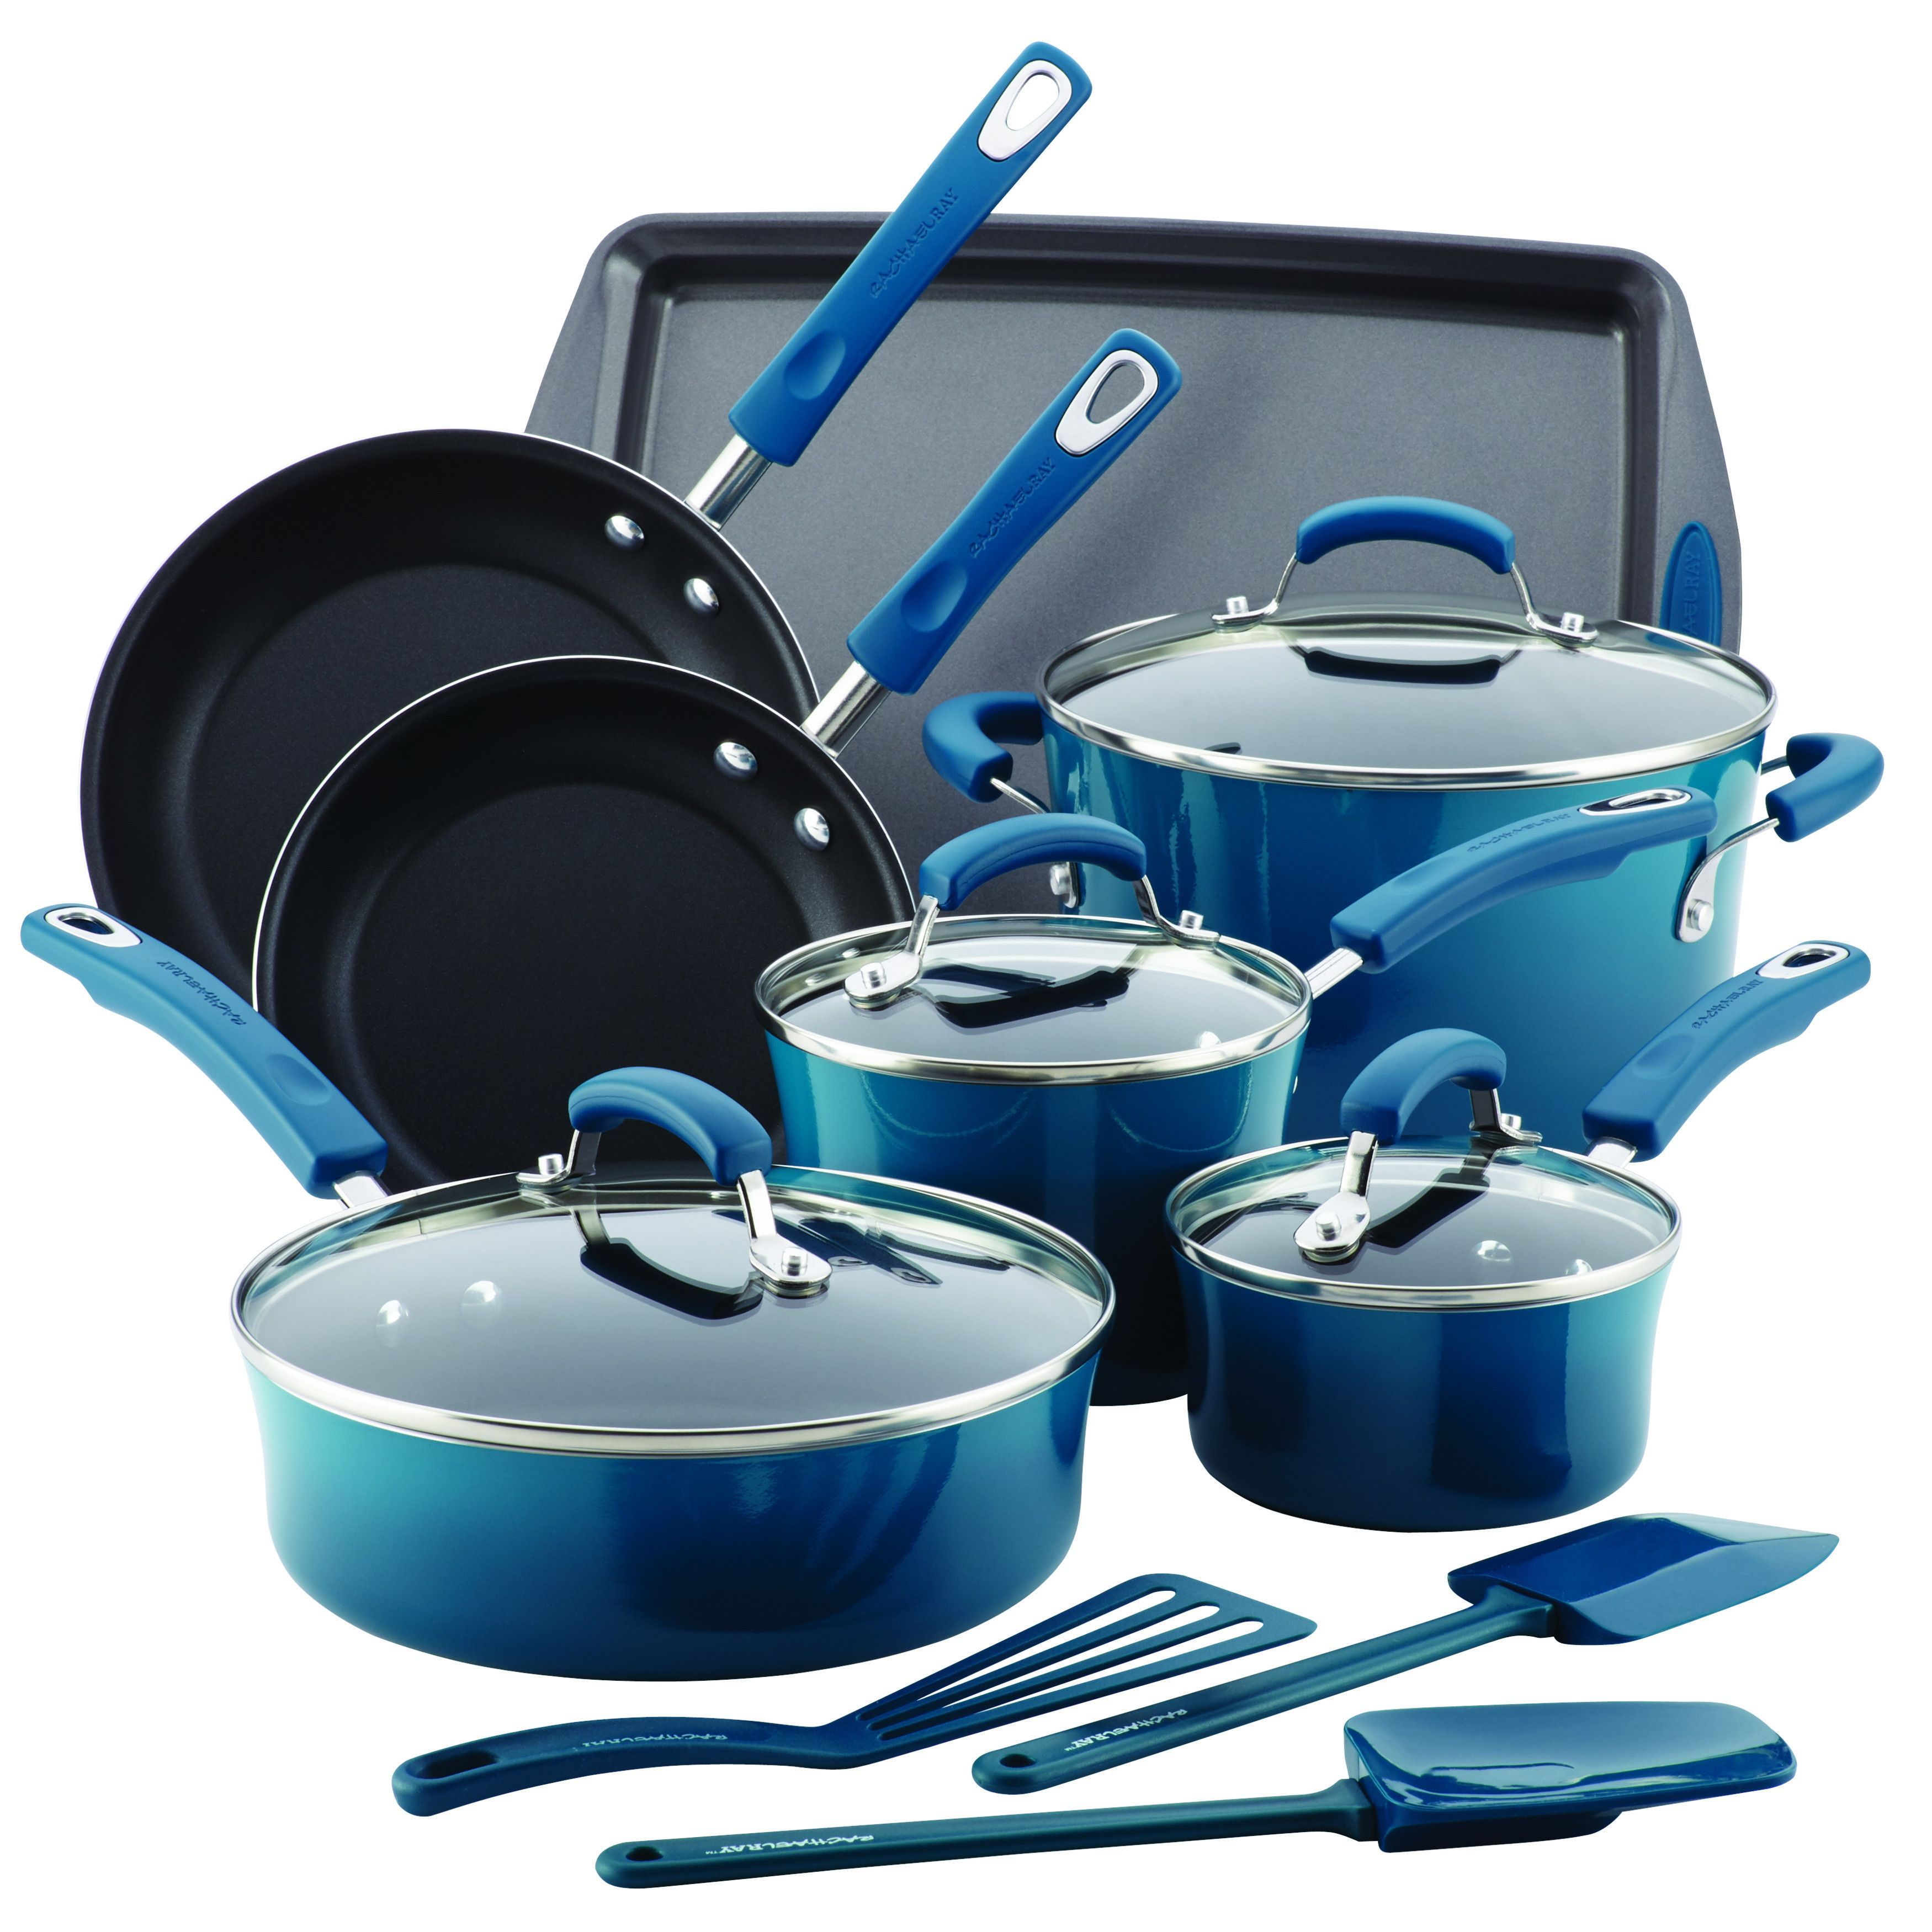 Rachael Ray Hard Enamel Nonstick 14-Piece Cookware Set, Marine ...